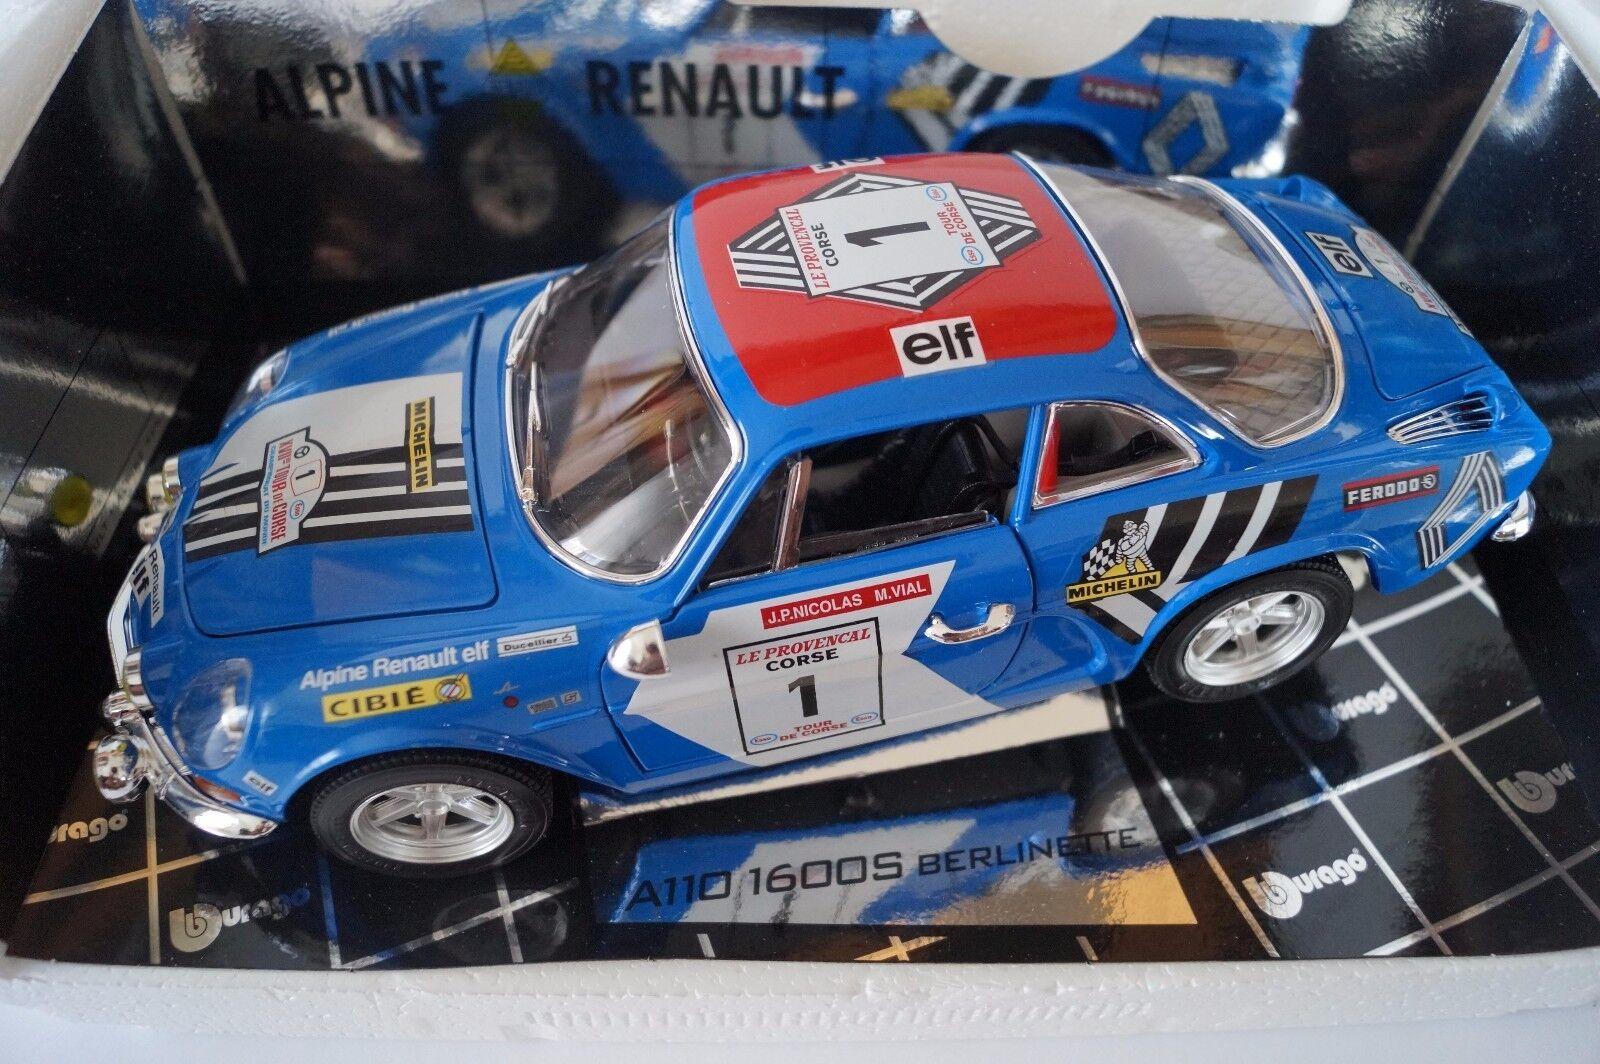 BBURAGO BURAGO voiture miniature 1 18 RENAULT ALPINE A 110 Berlinette nº 1  dans neuf dans sa boîte